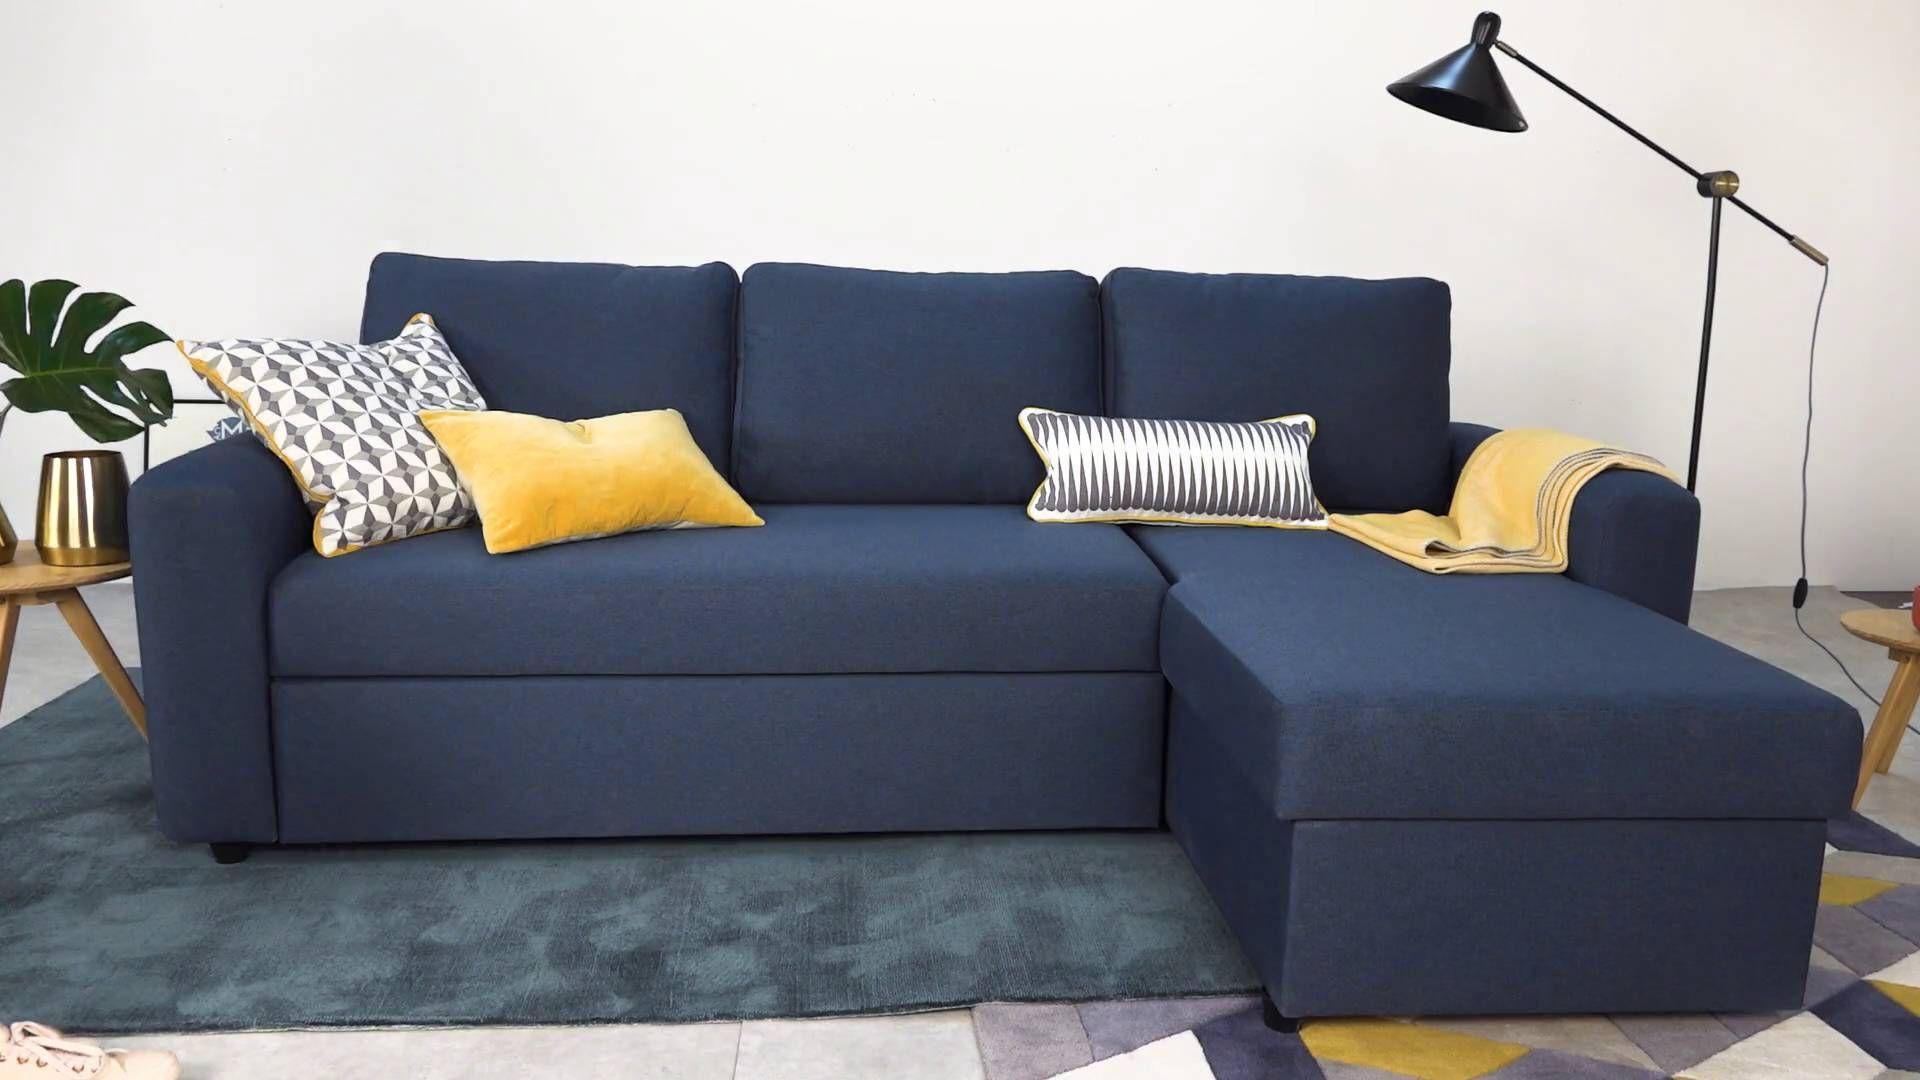 Aidian Corner Storage Sofa Bed, Regal Blue Sofa bed